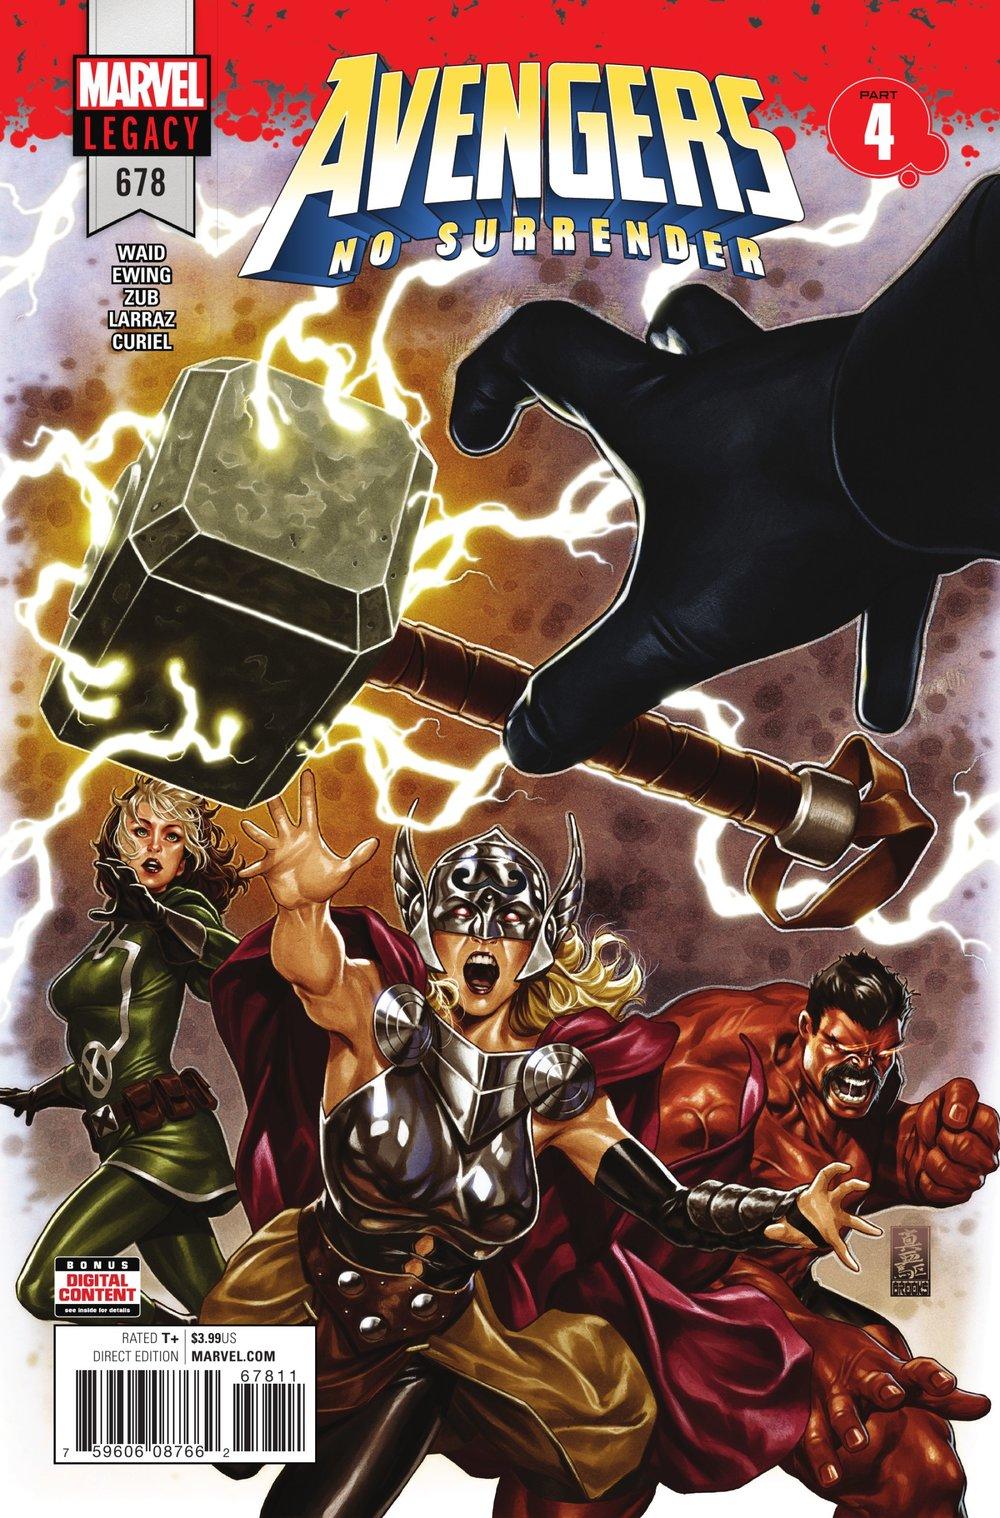 Avengers 678 cover.jpeg